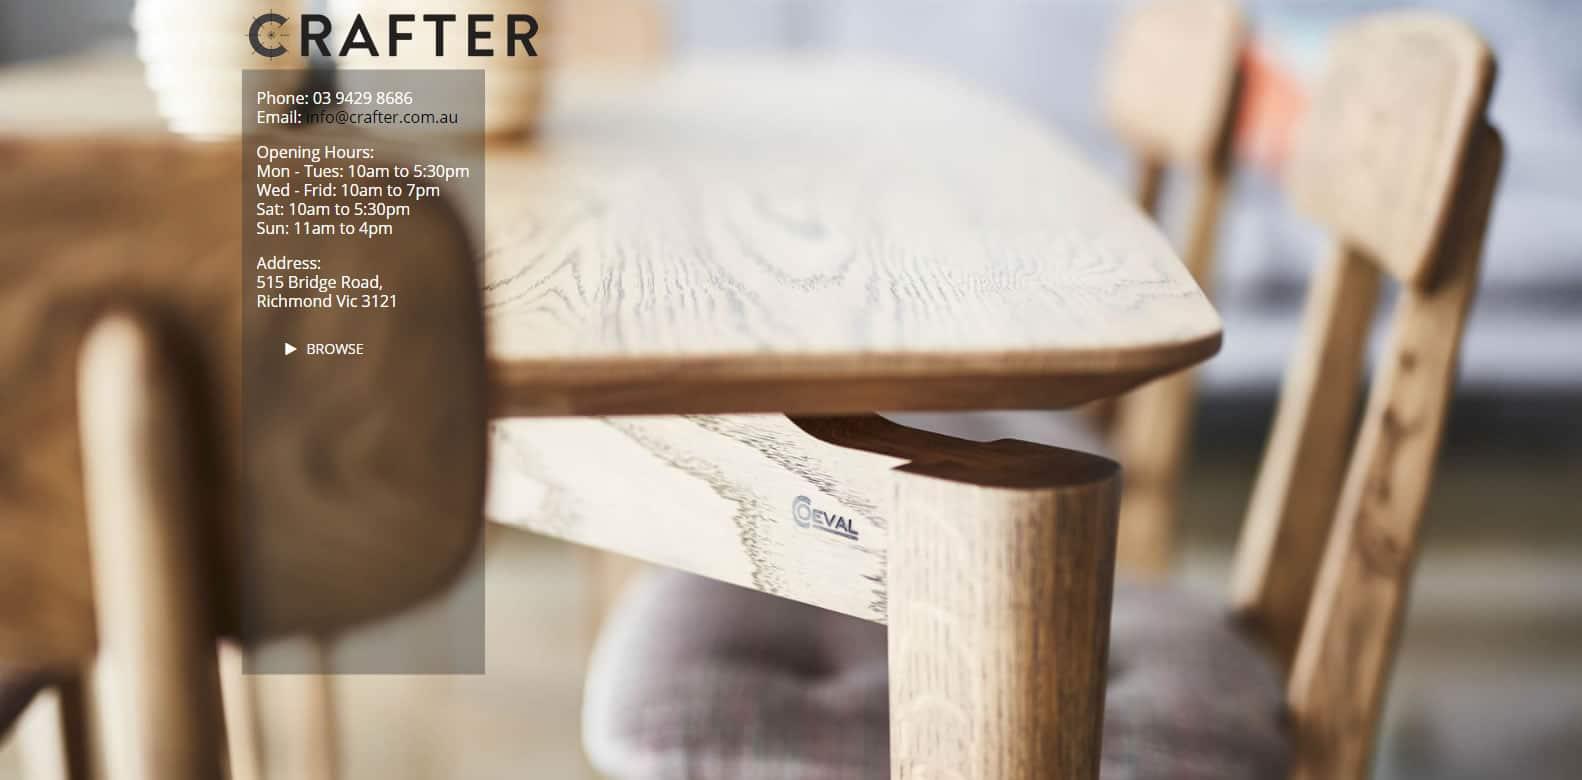 Crafter Web Design